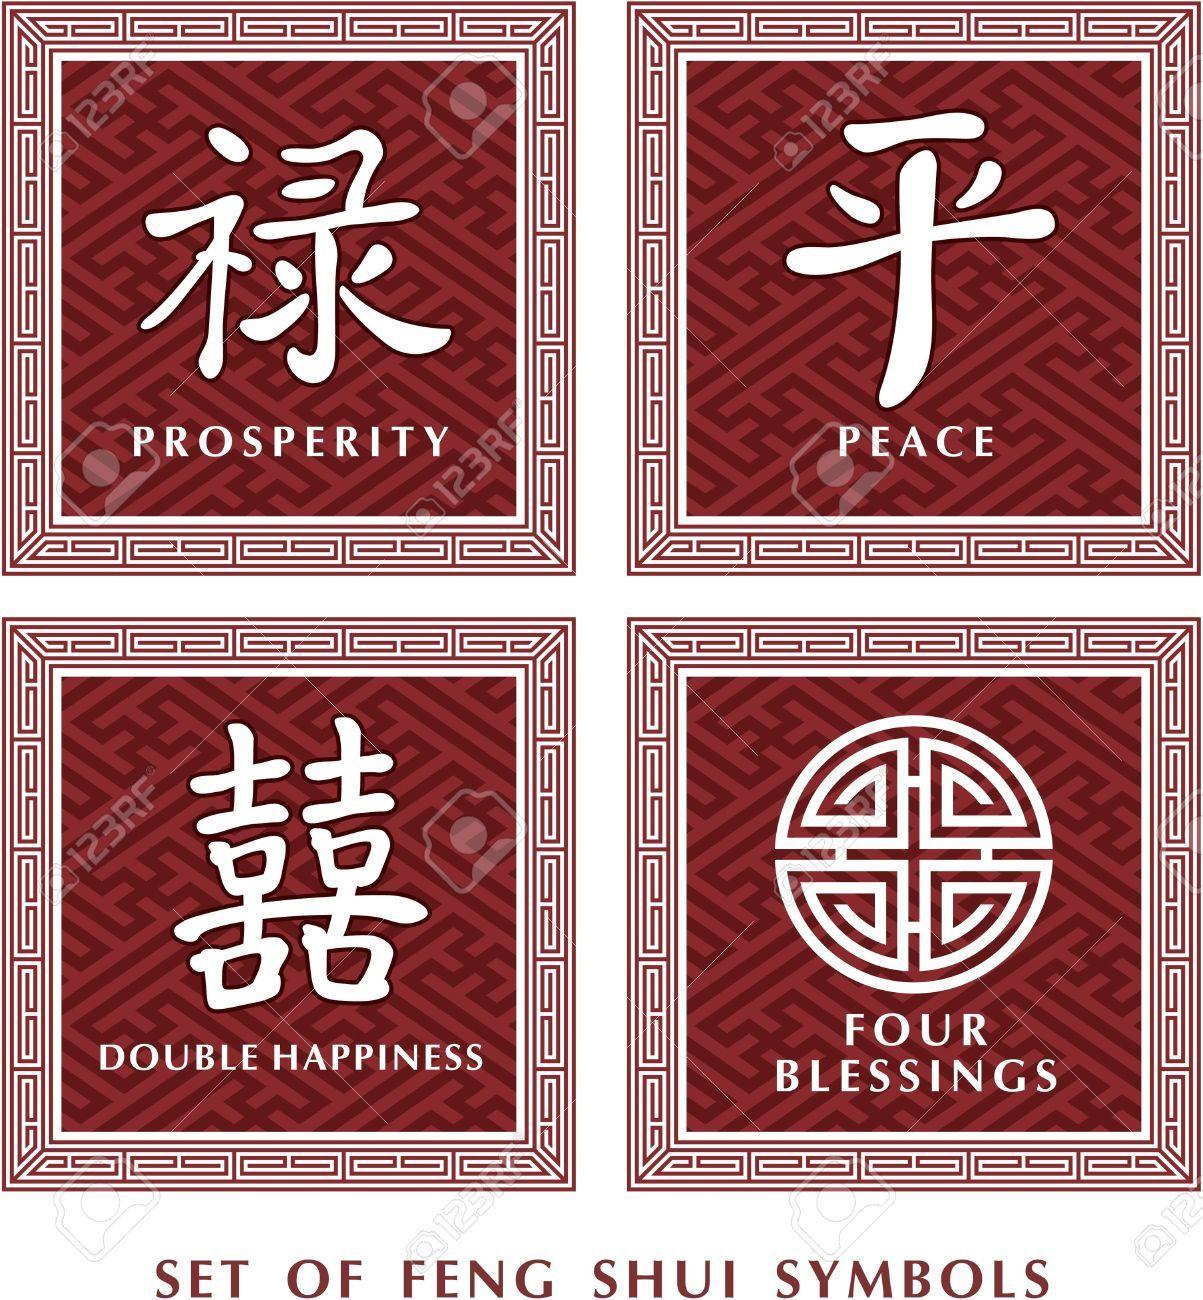 Set Of Feng Shui Symbols Chinese Calligraphy Pinterest Feng